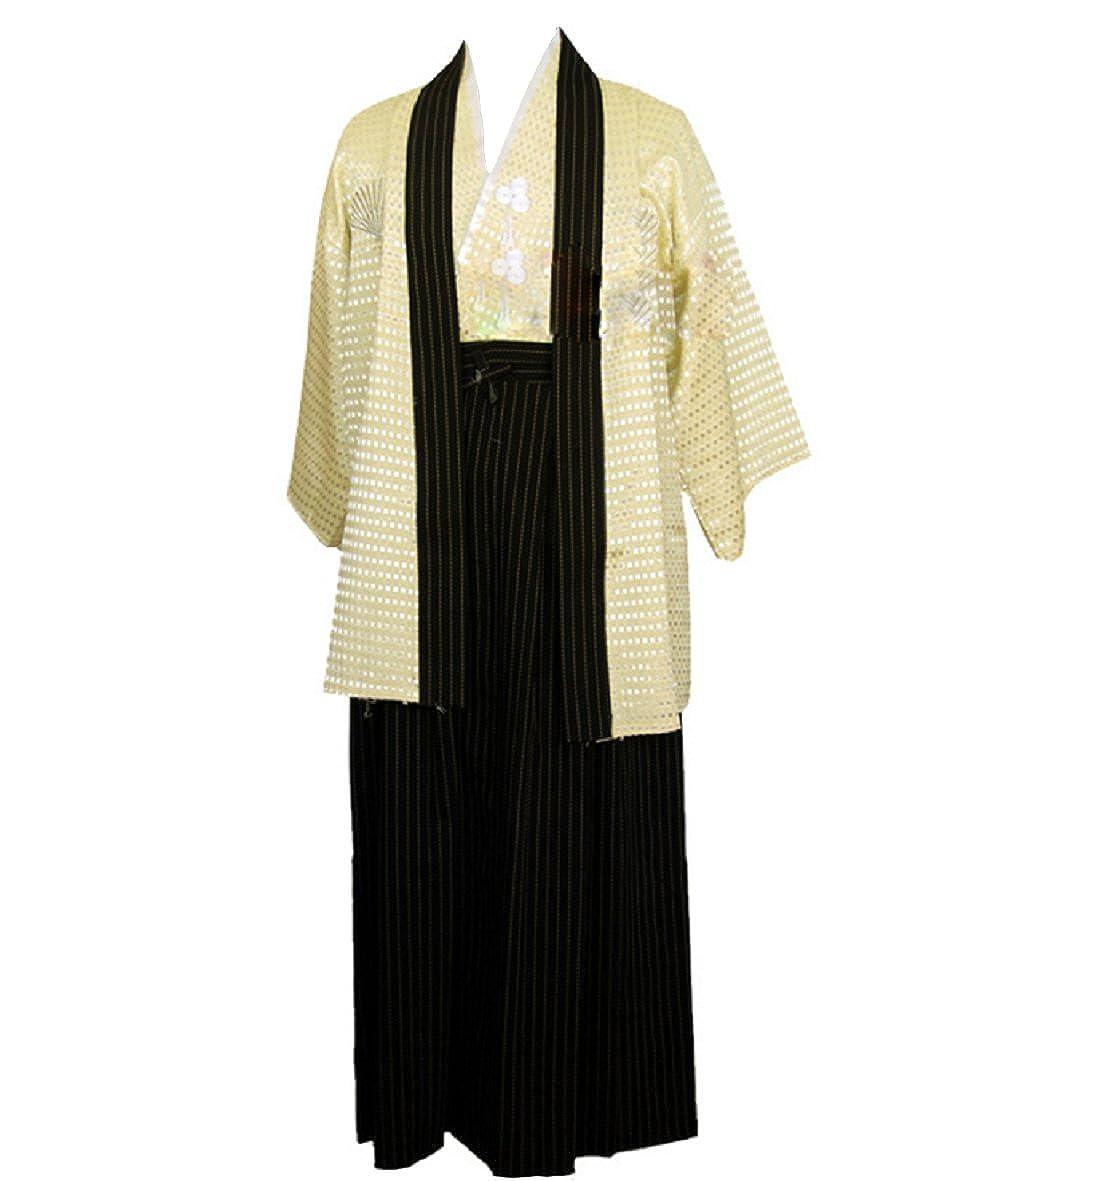 ACVIP Men's Traditional Samurai Japanese Kimono Robe Cosplay Costume